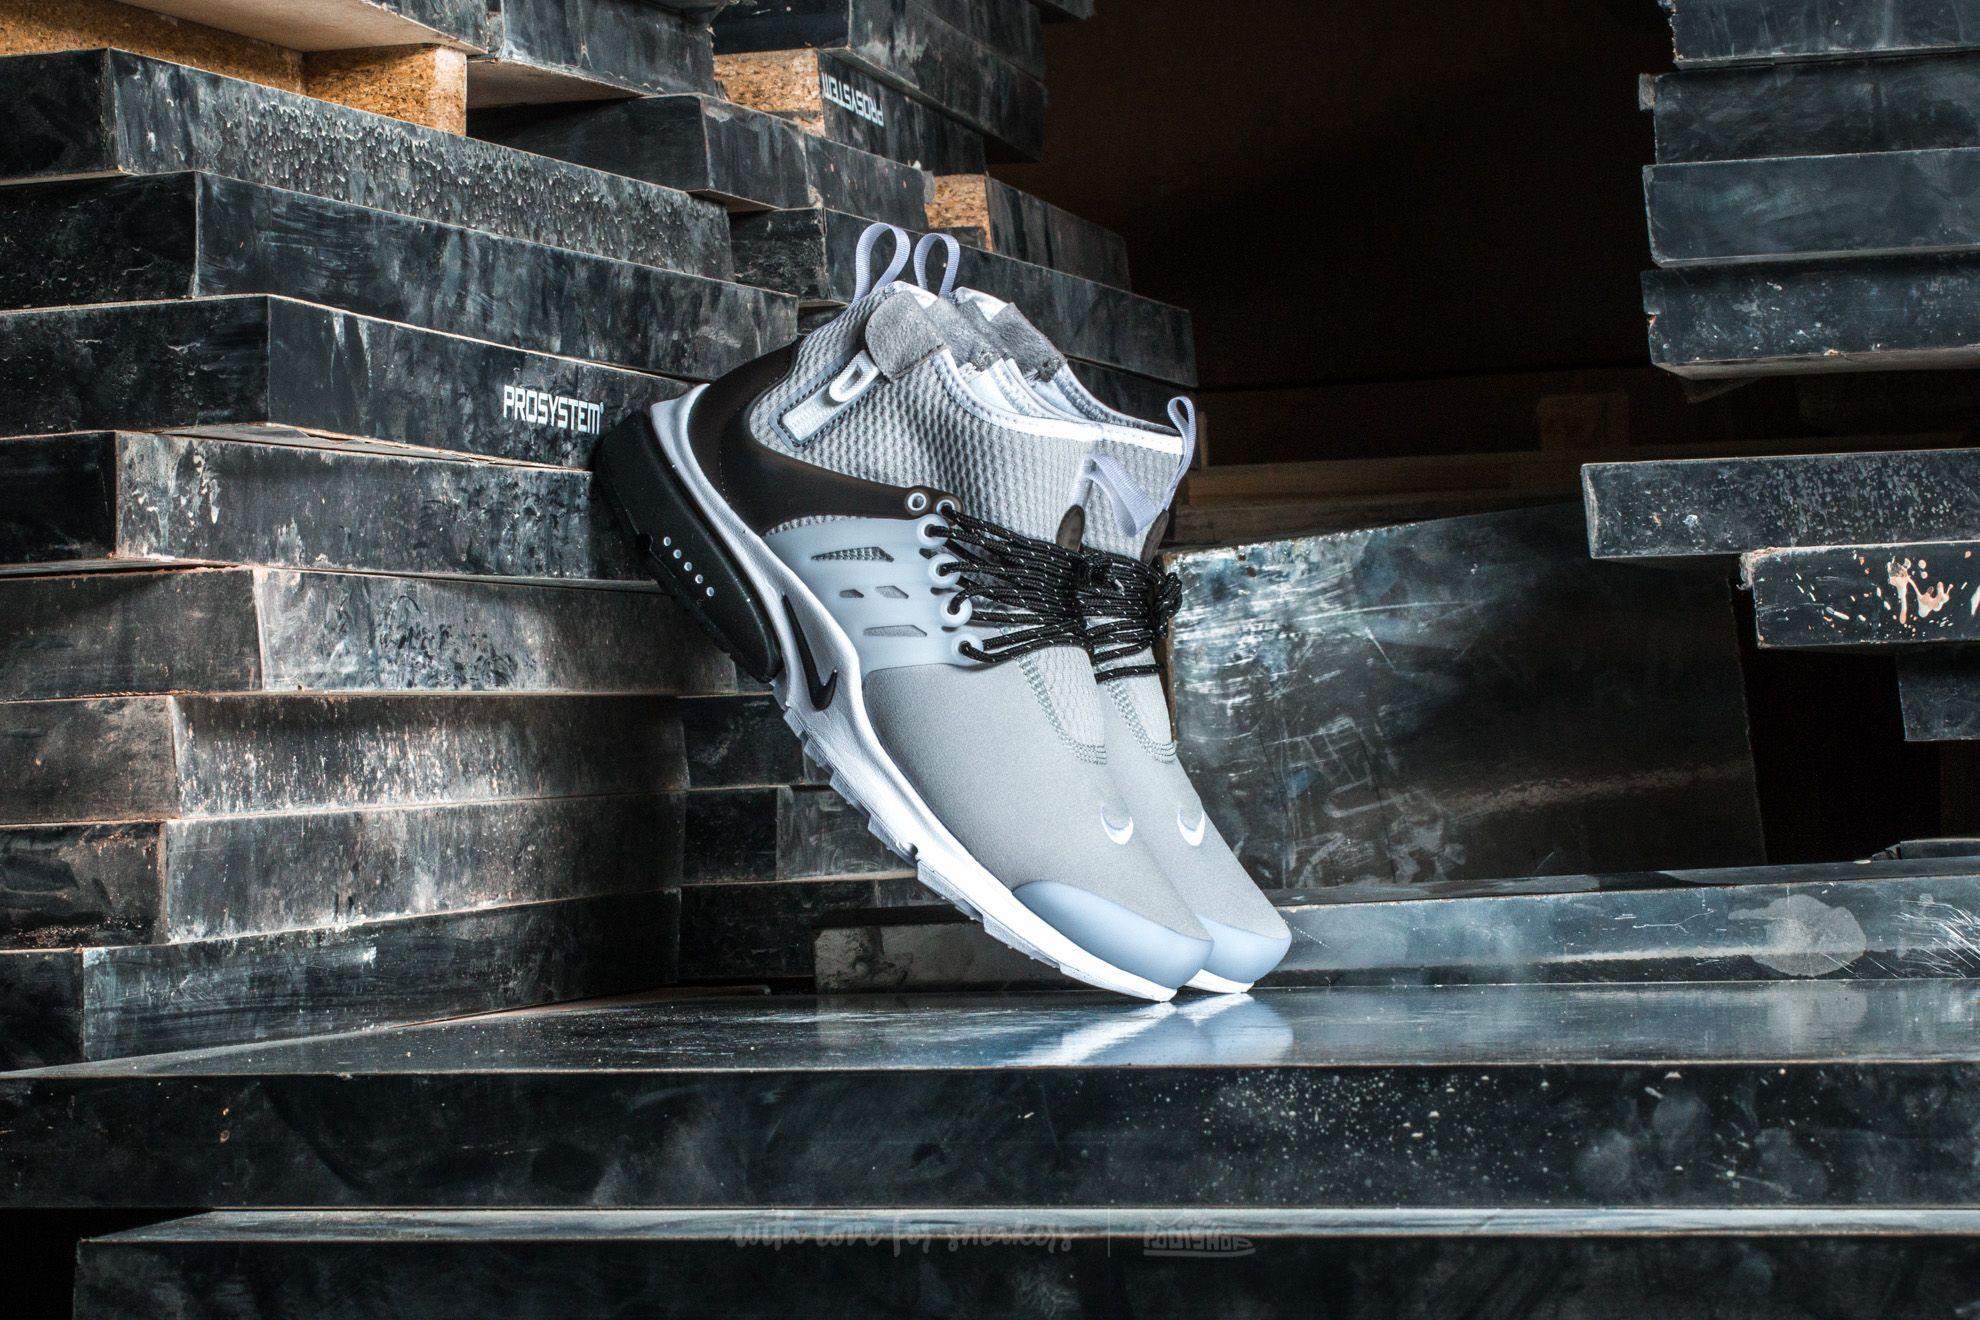 b23ebc34049 Nové sneakers Nike Air Presto Mid Utility